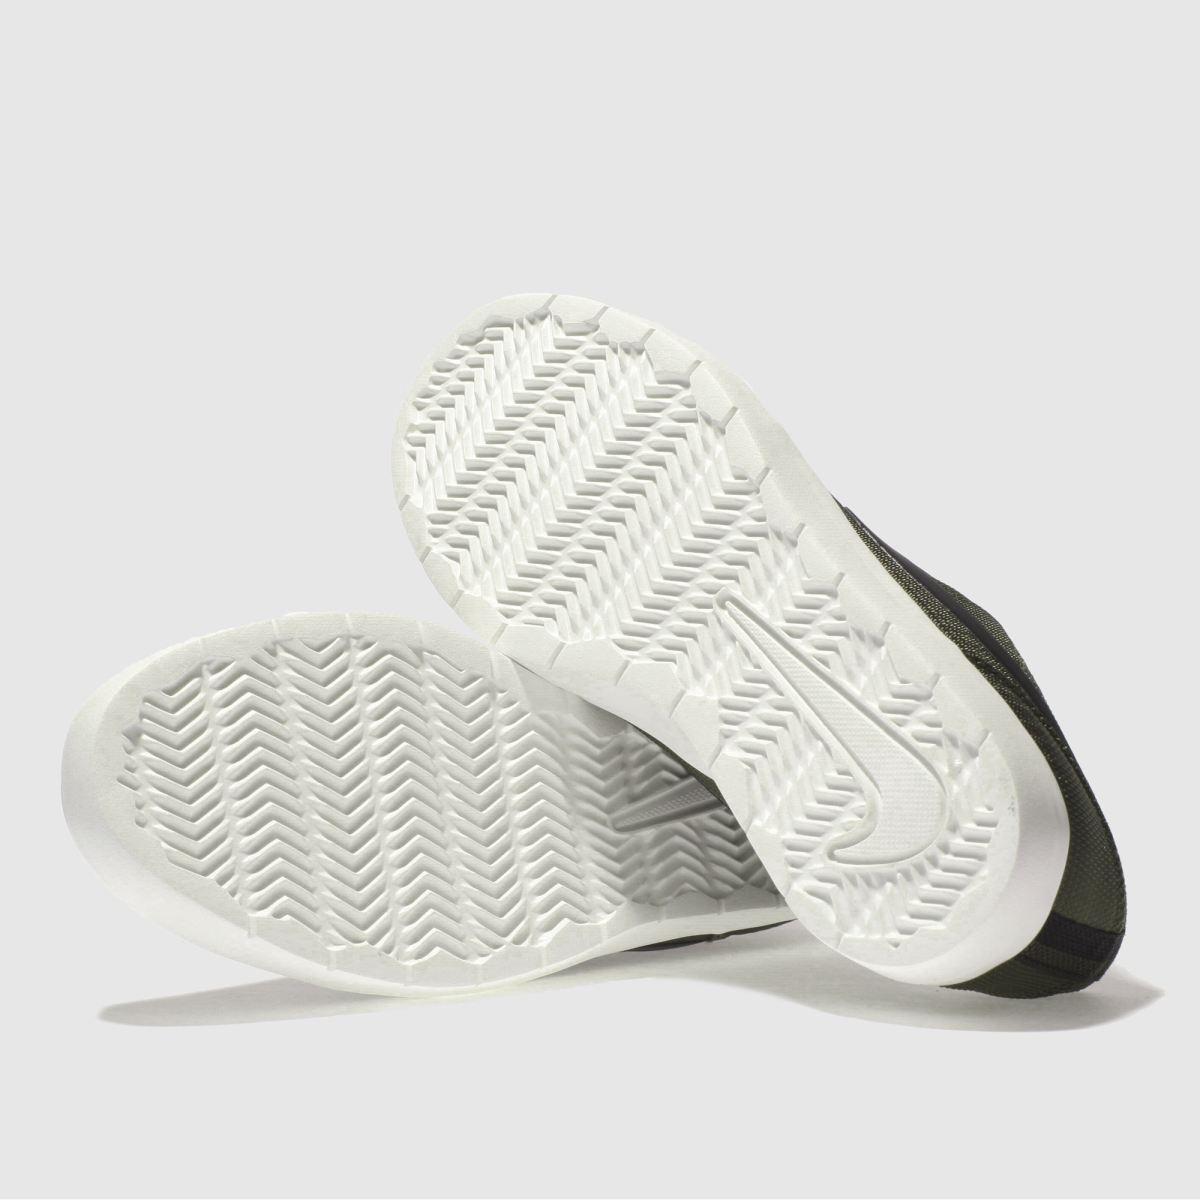 Herren Khaki nike sb Portmore Ii Gute Ultralight Sneaker   schuh Gute Ii Qualität beliebte Schuhe 9af5f6